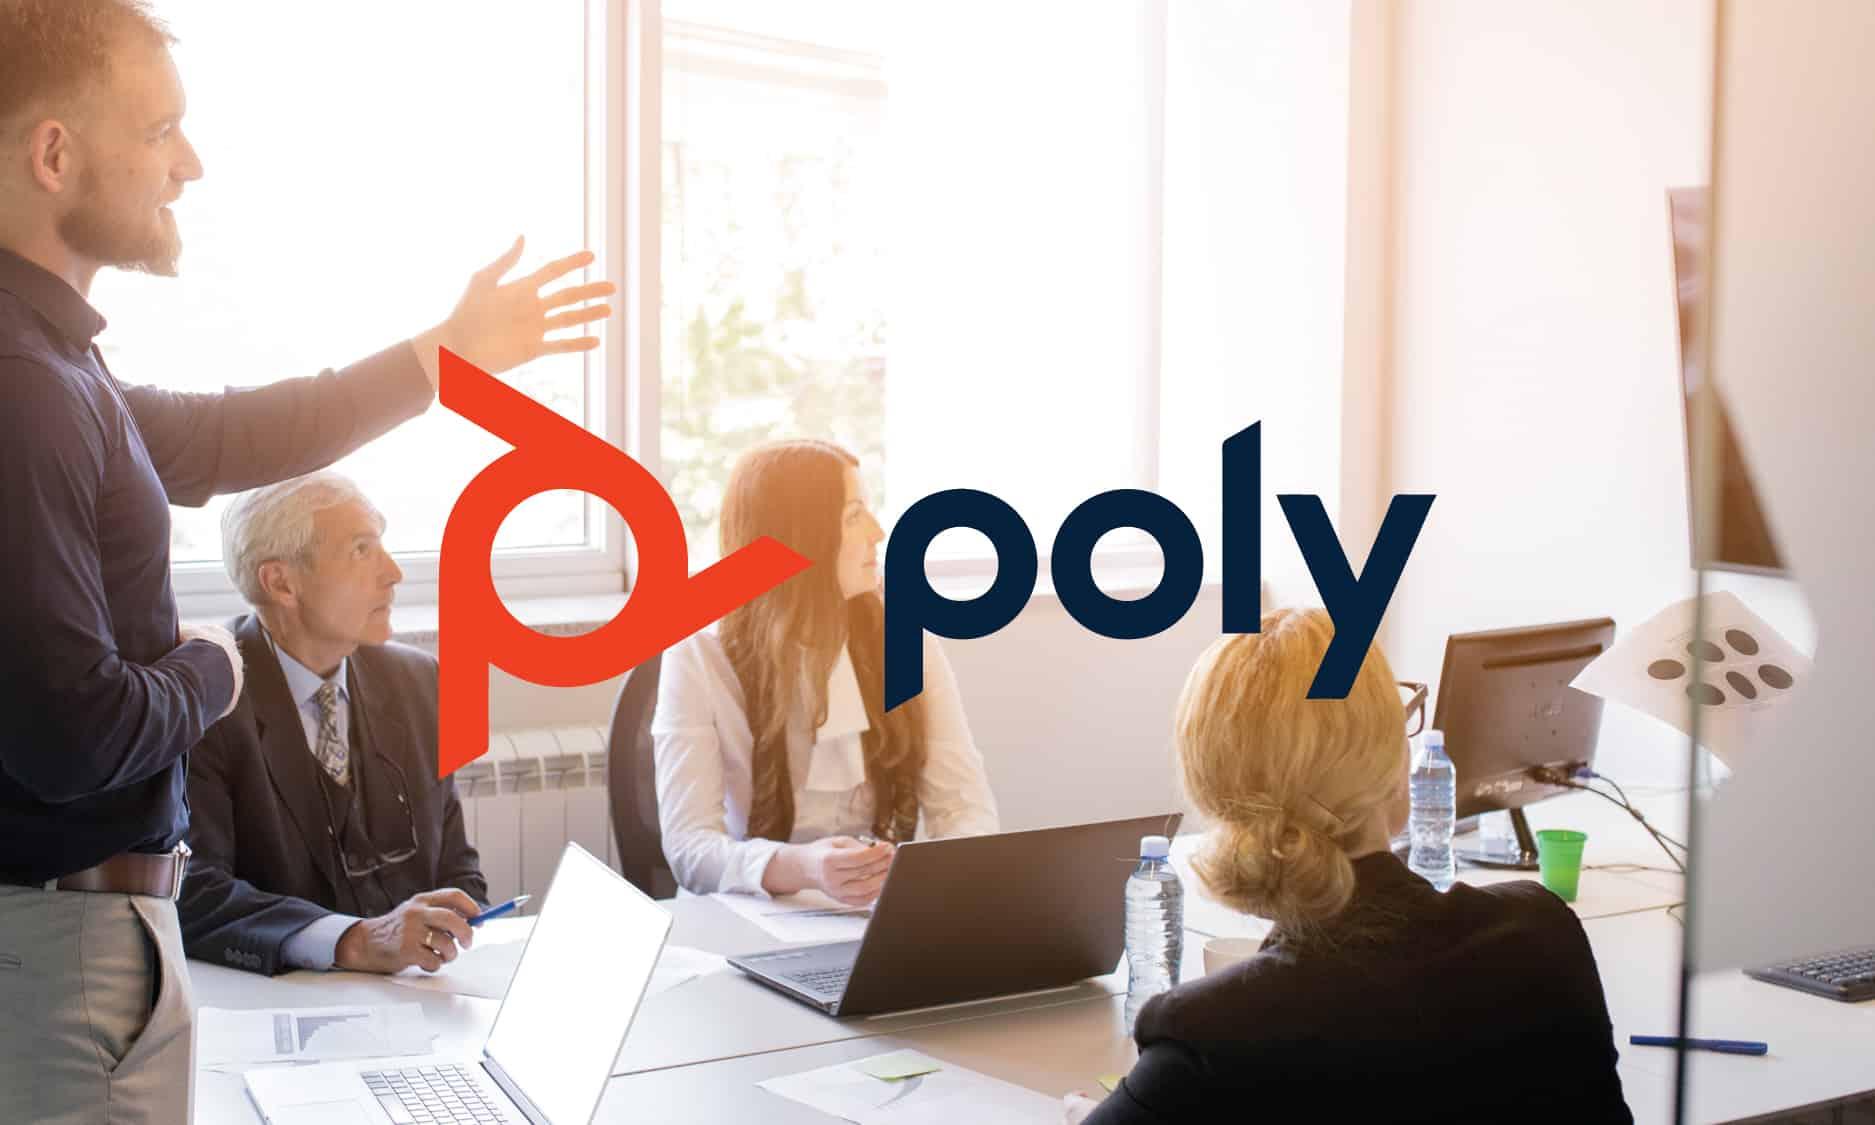 poly-reuni%C3%B3n.jpg